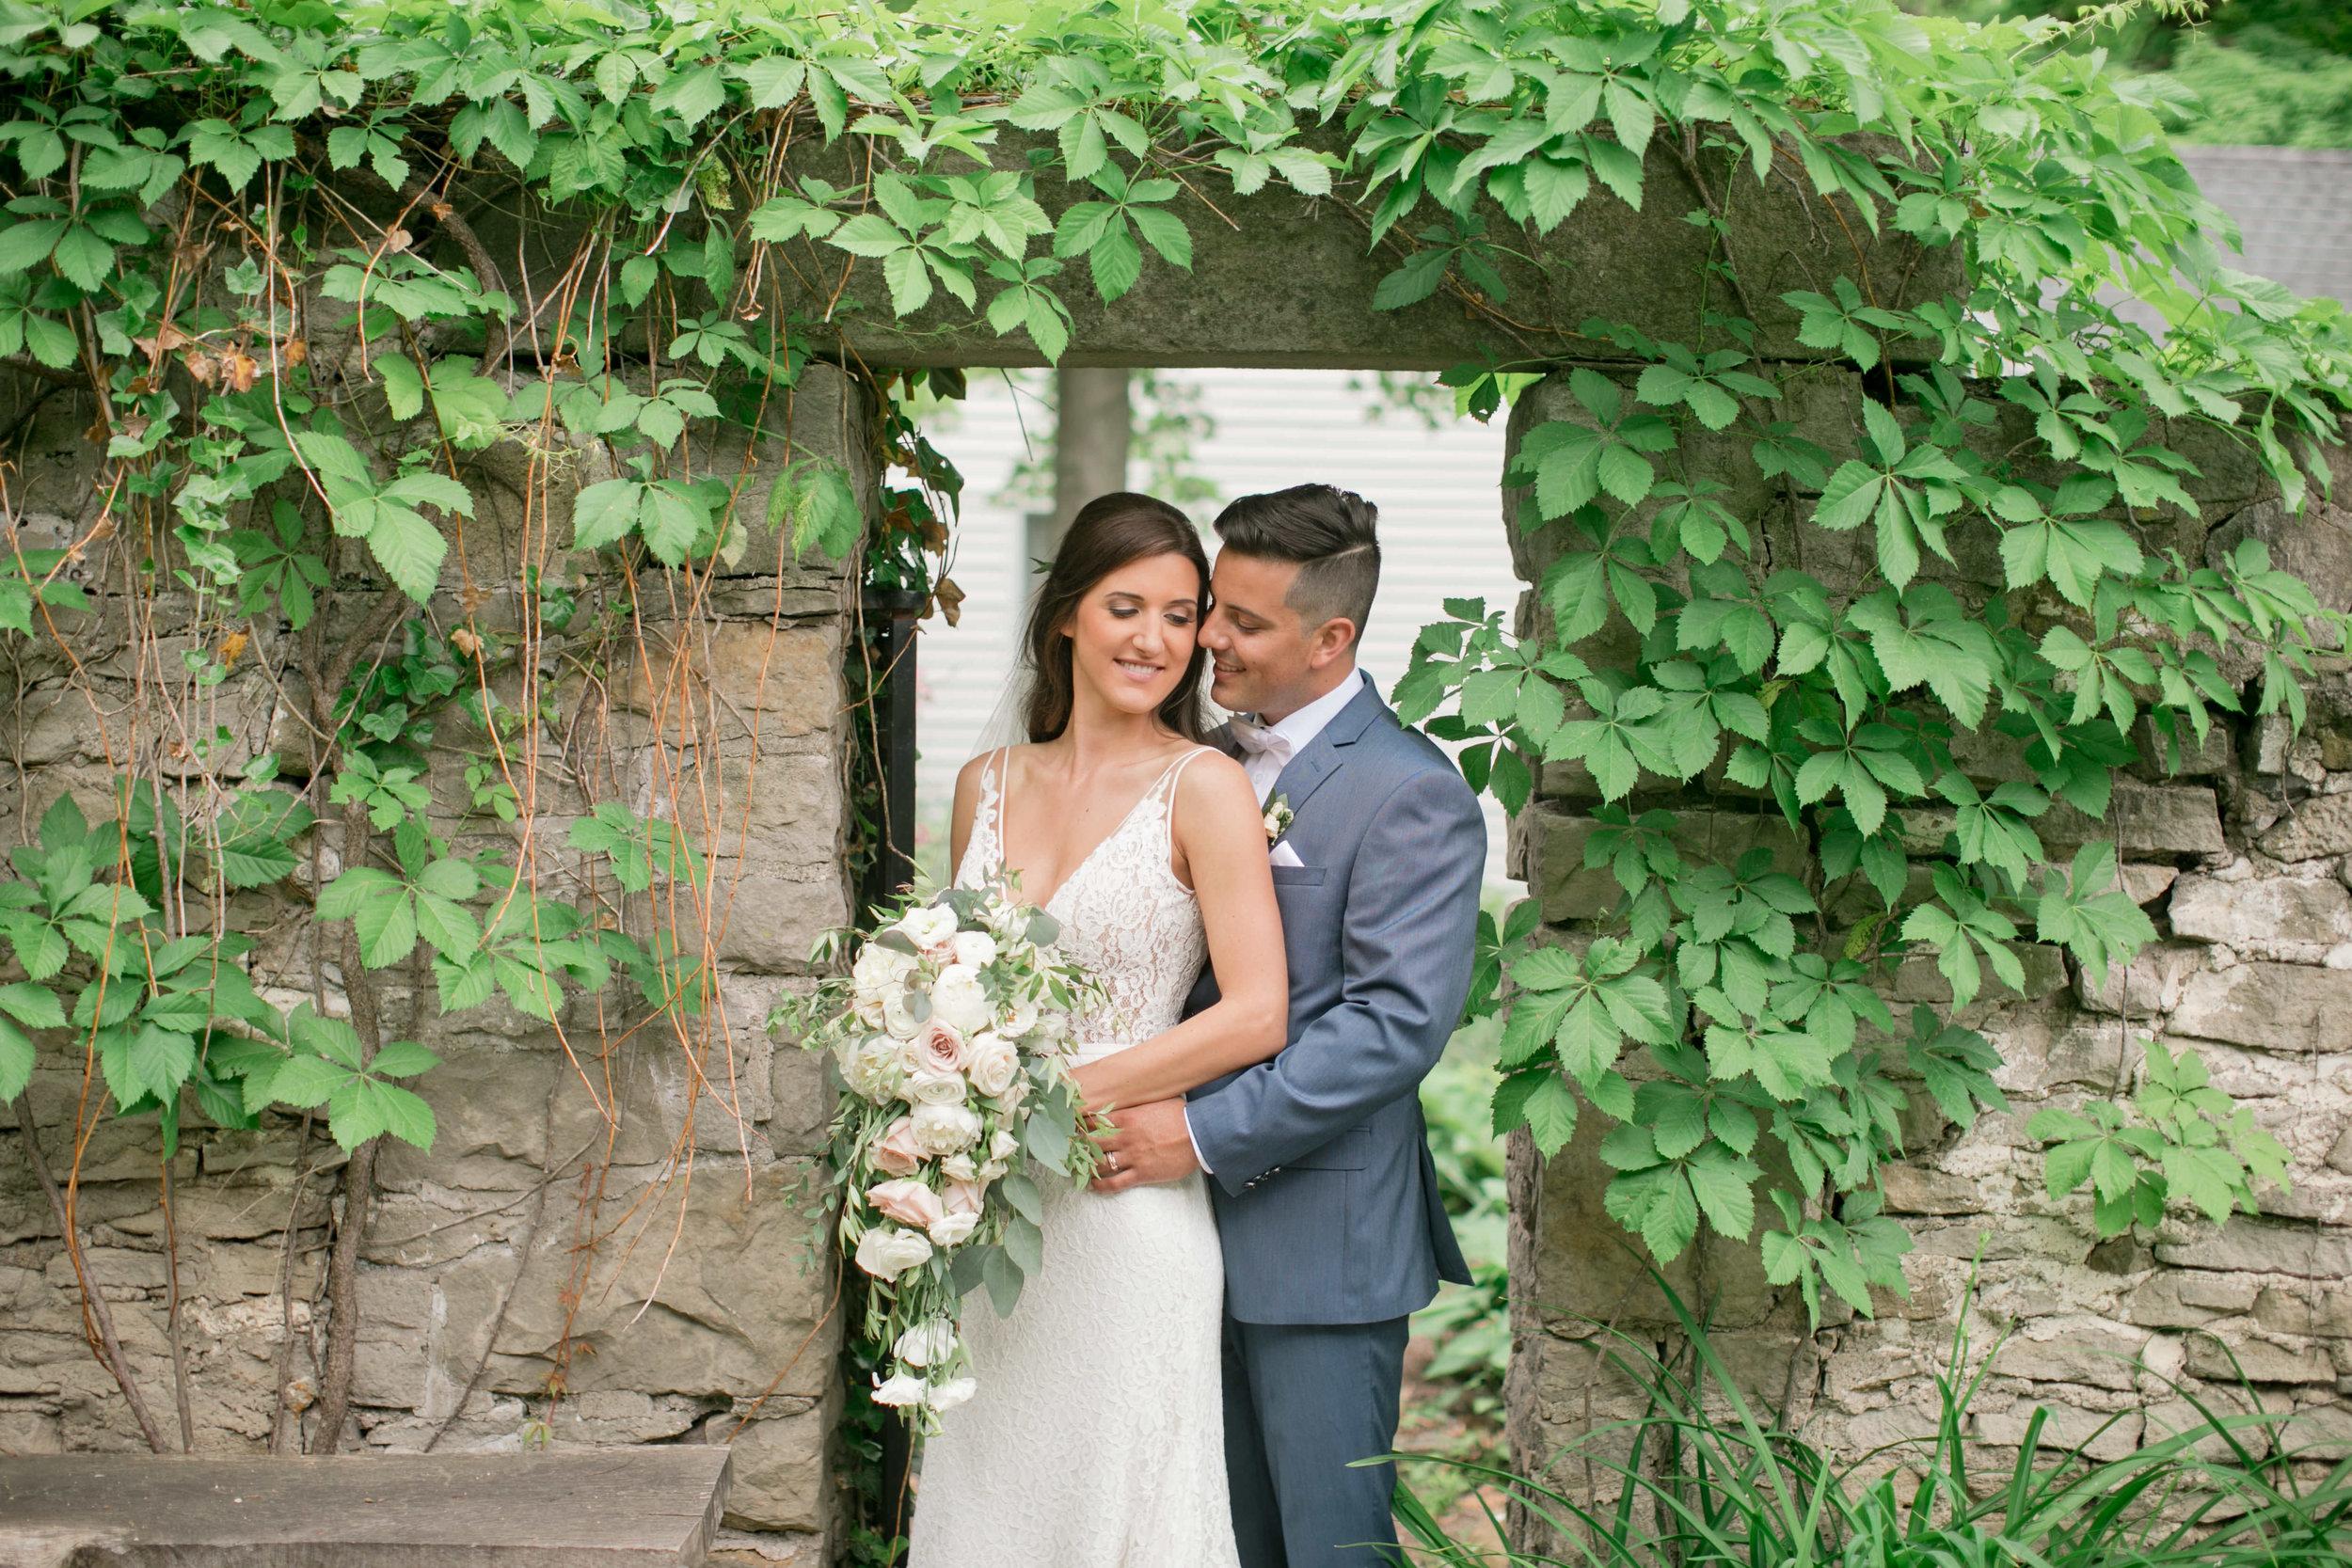 Miranda___Daniel___Daniel_Ricci_Weddings___High_Res._Finals_427.jpg